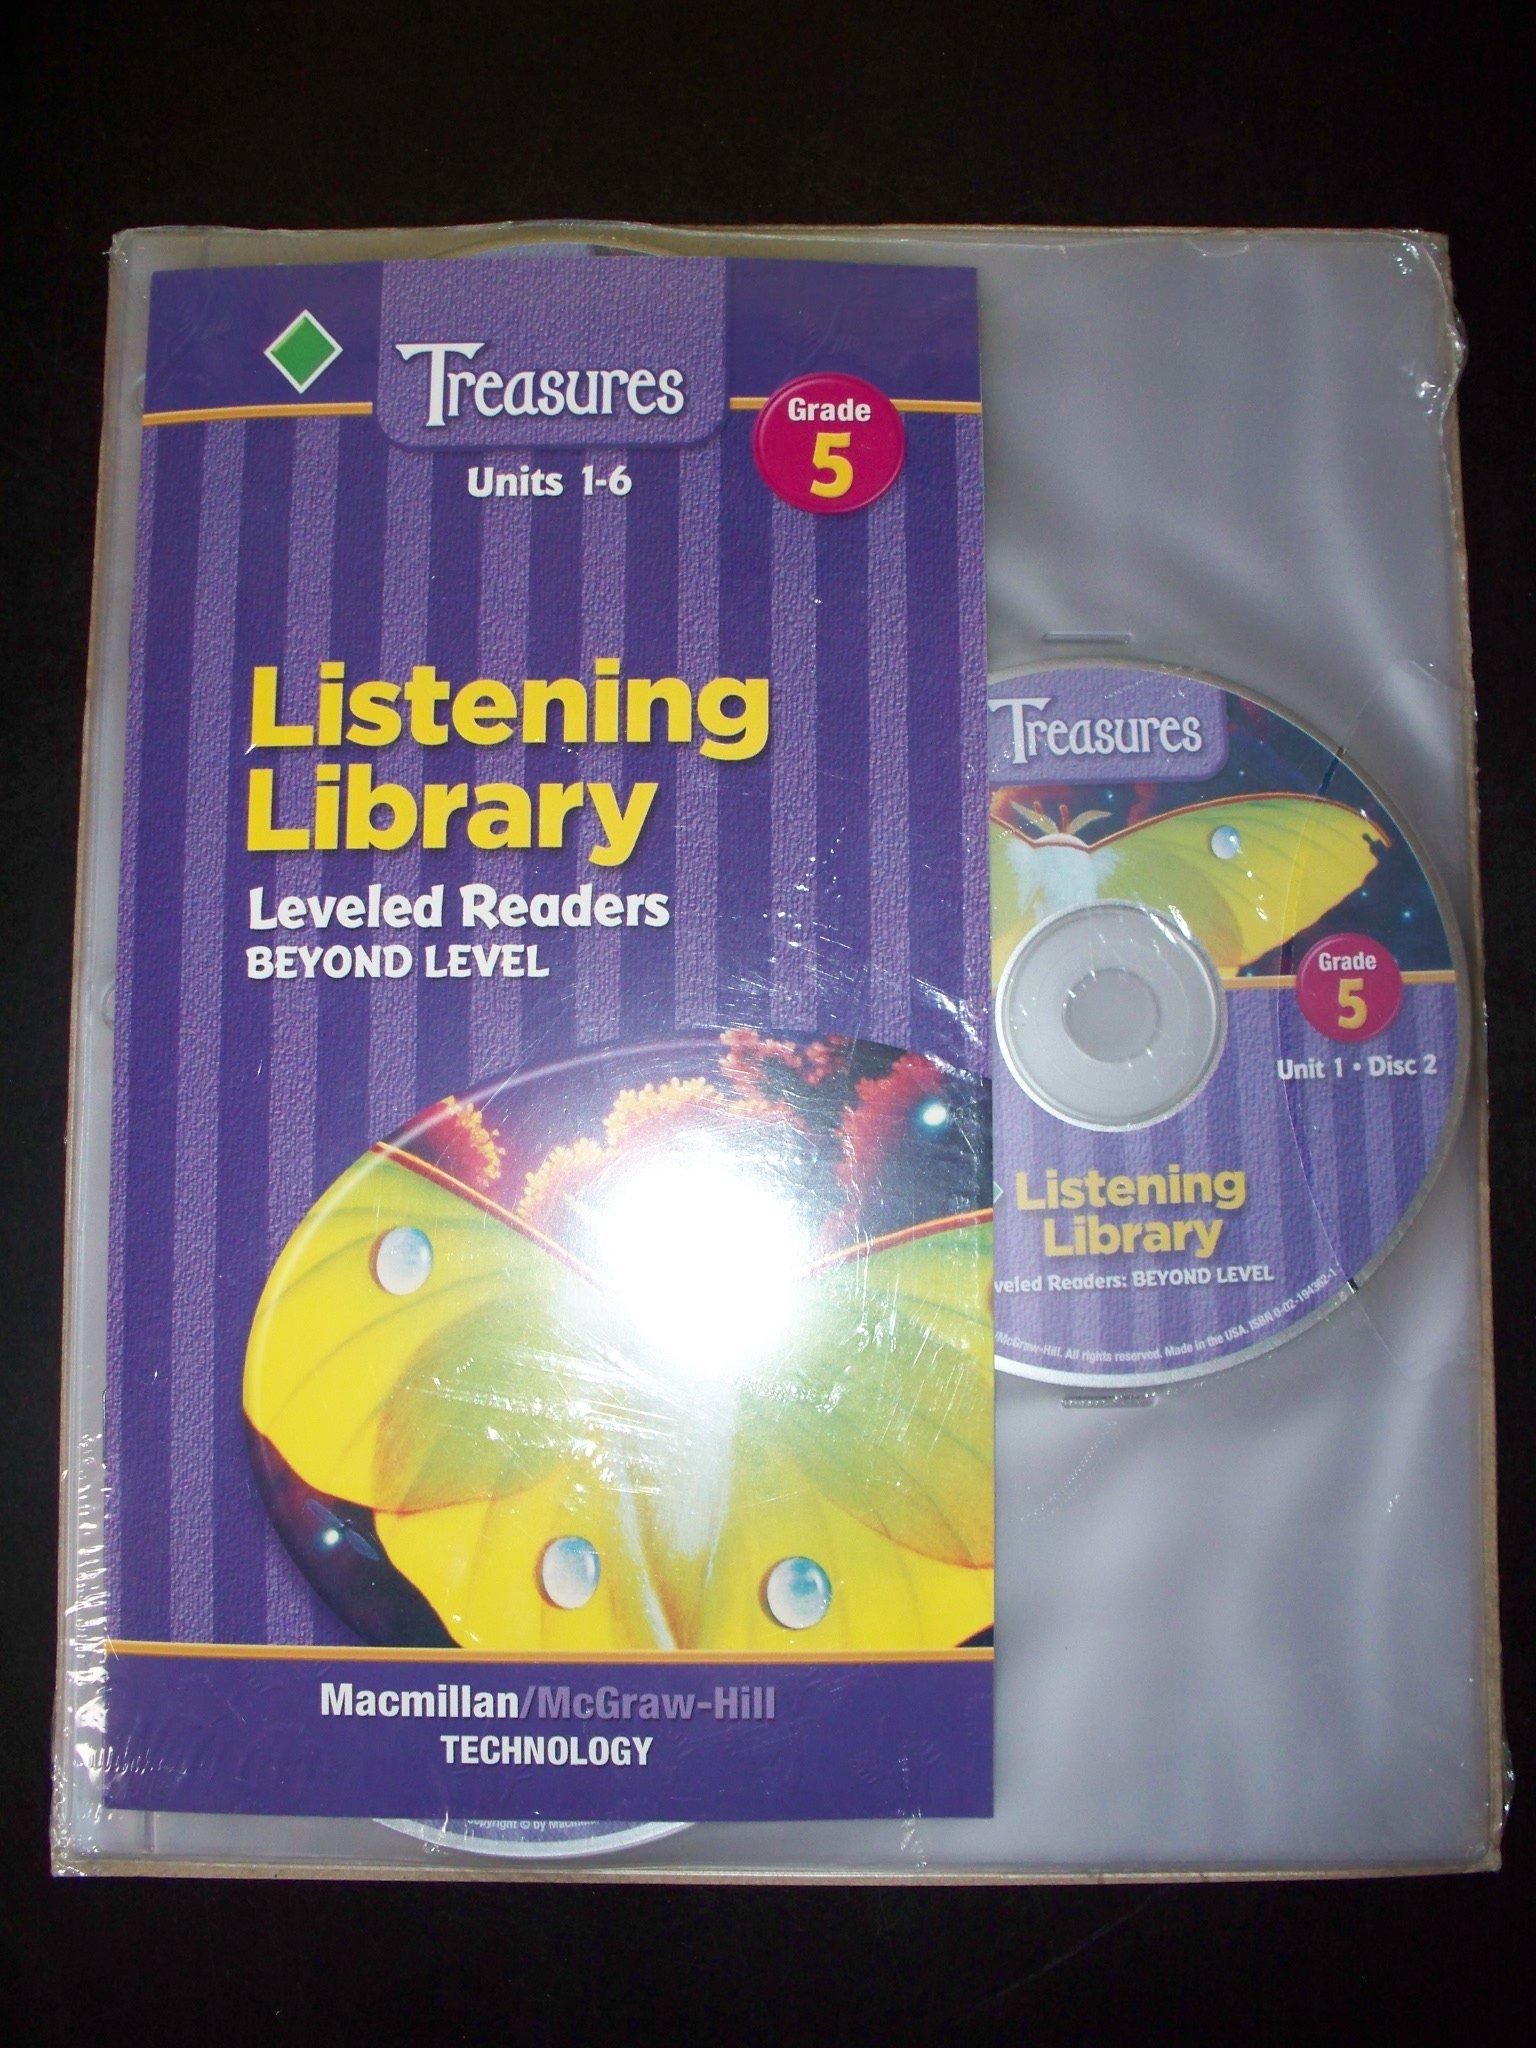 Treasures Listening Library Leveled Readers Beyond Level Audio CD's - Grade  5, Units 1-6: MacMillan McGraw-Hill: 9780021943623: Amazon.com: Books